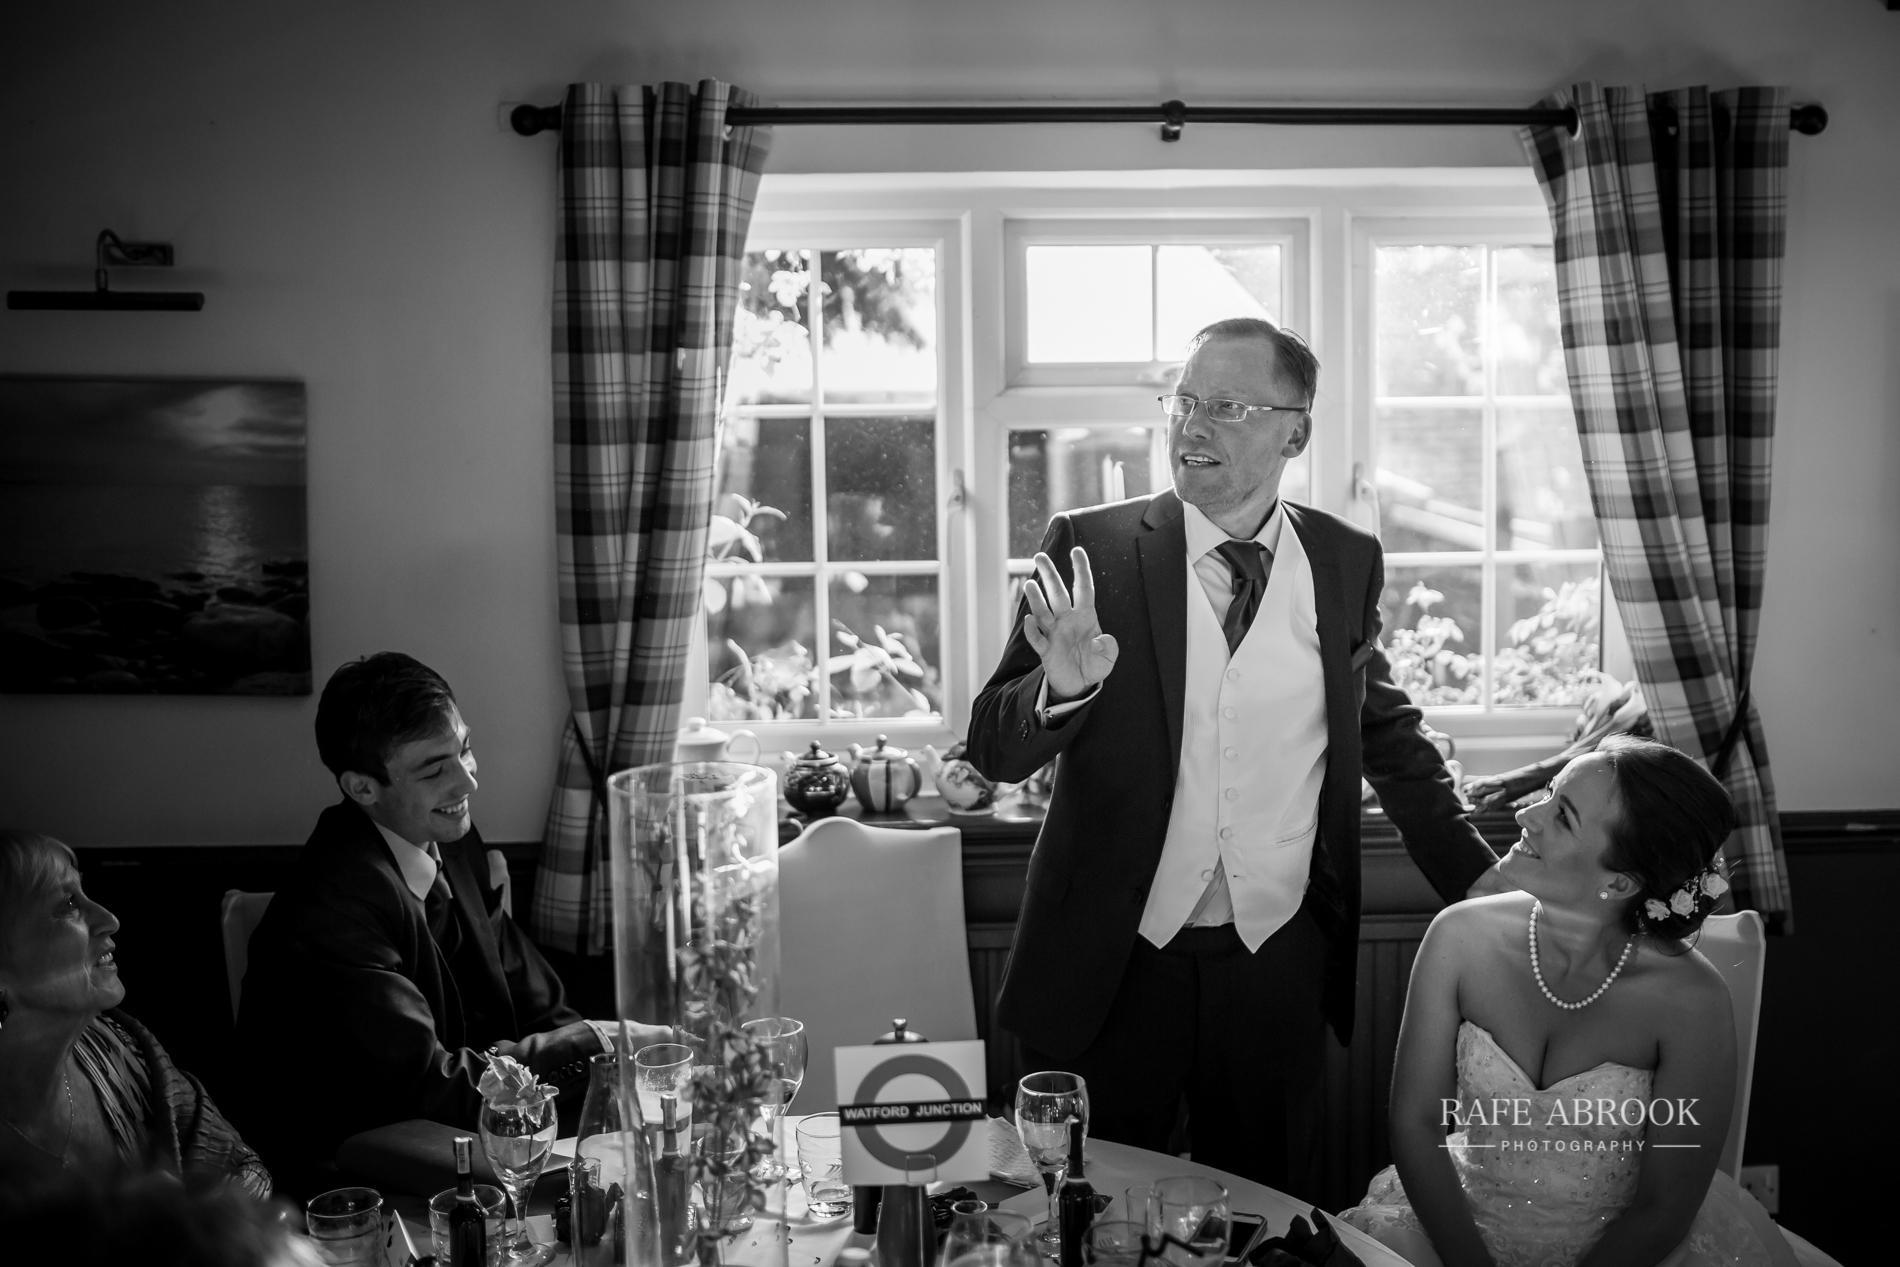 agnes & laurence wedding kings lodge hotel kings langley hertfordshire-1310.jpg